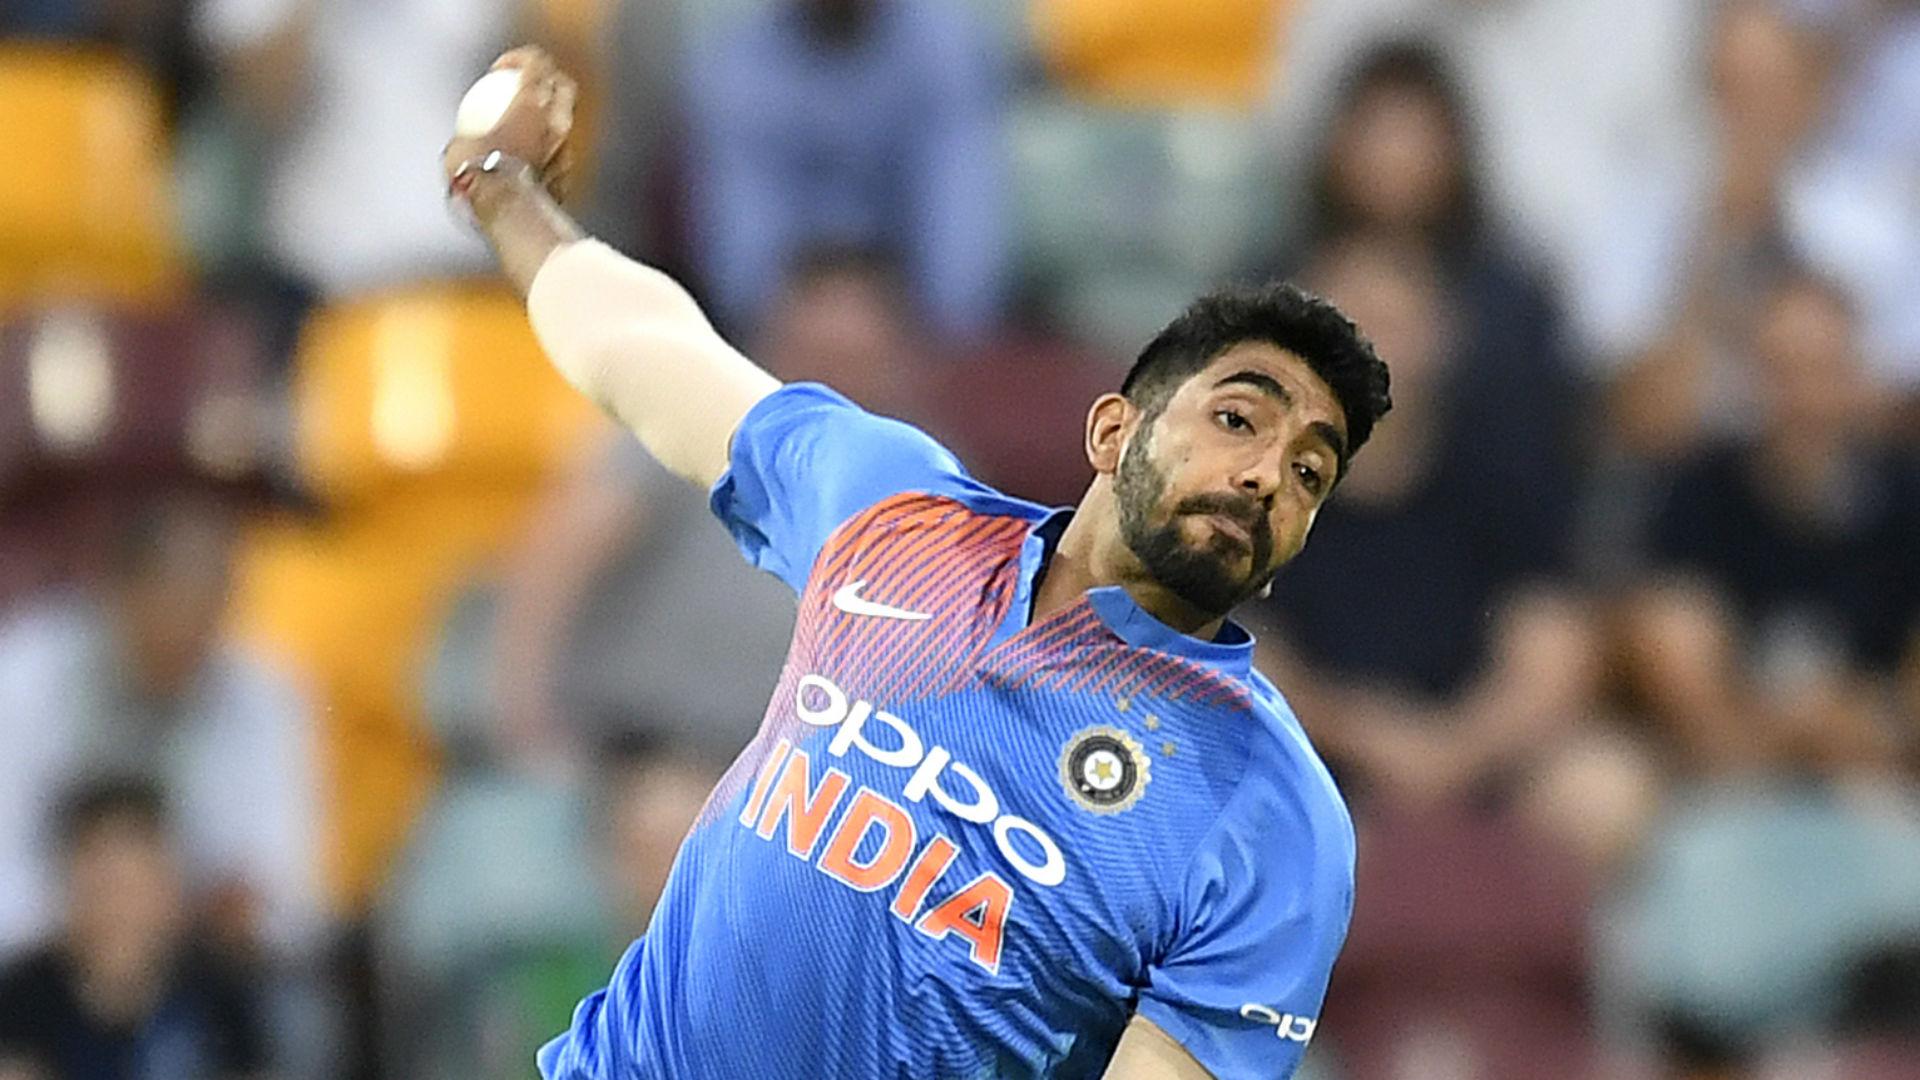 Bumrah and Dhawan return as India name squads to play Sri Lanka and Australia